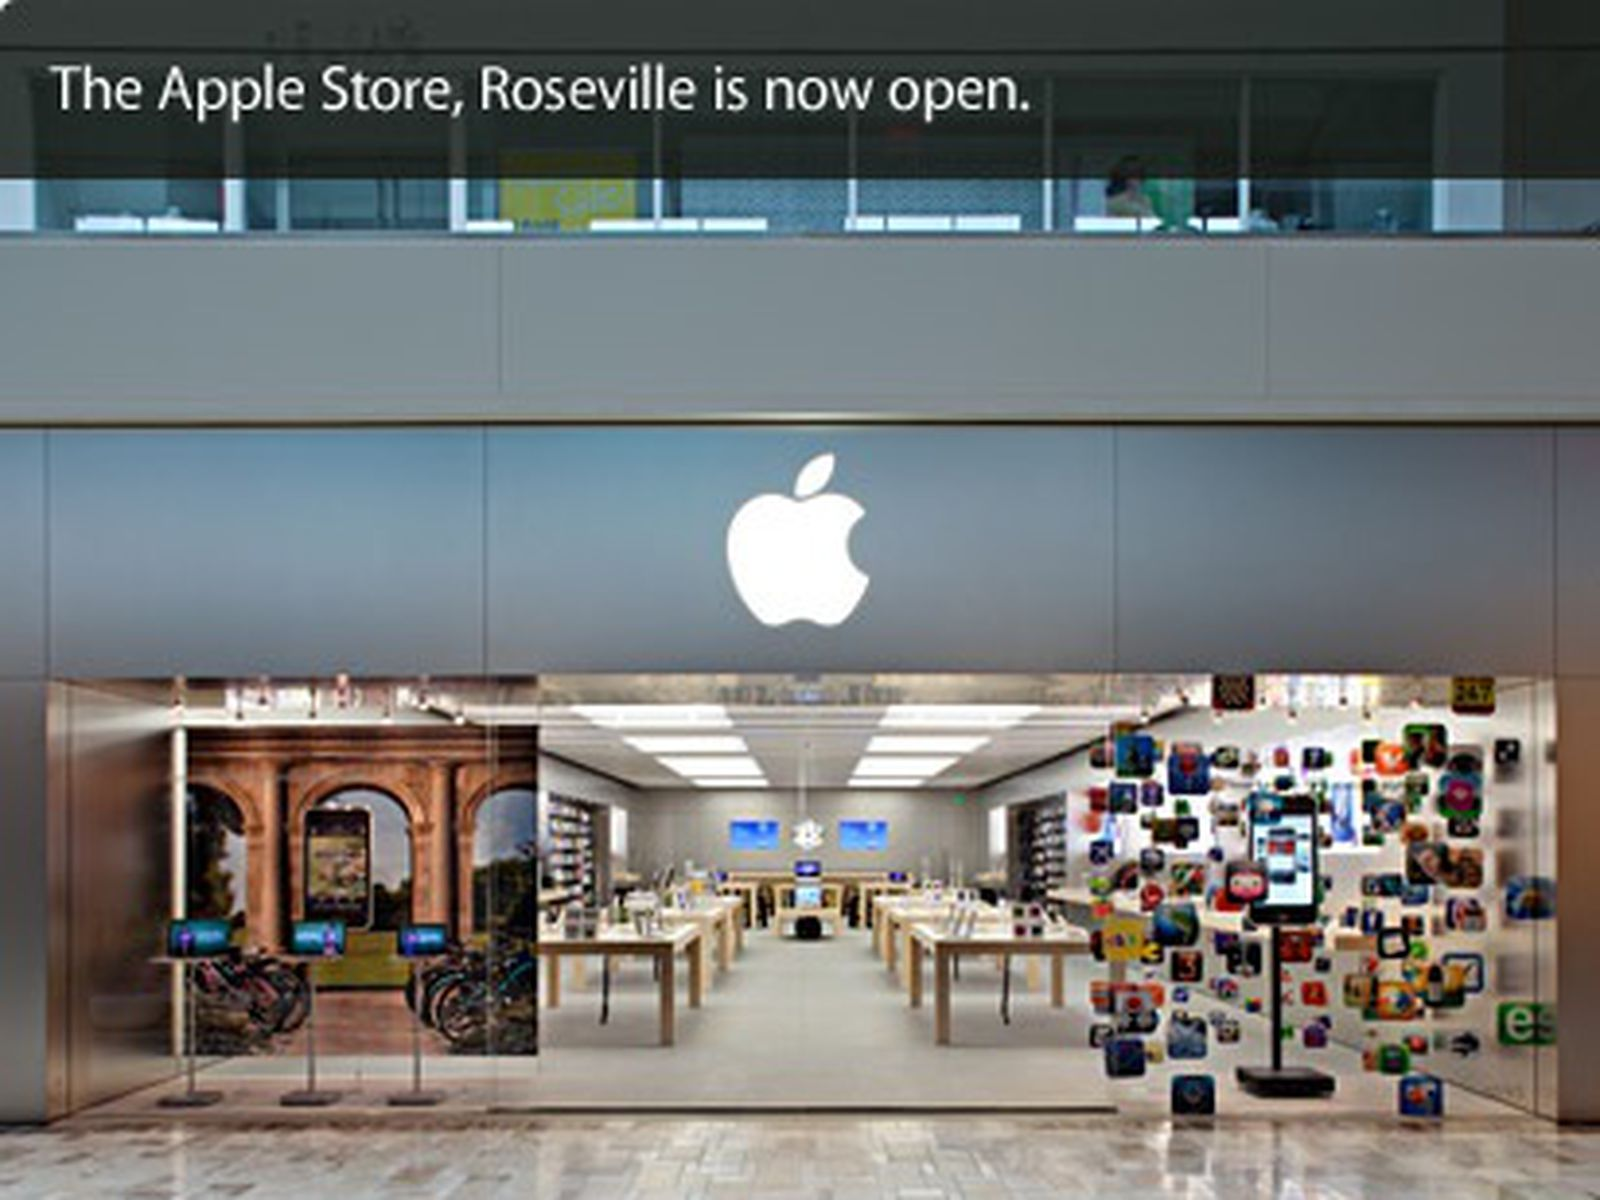 roseville galleria apple store reopens